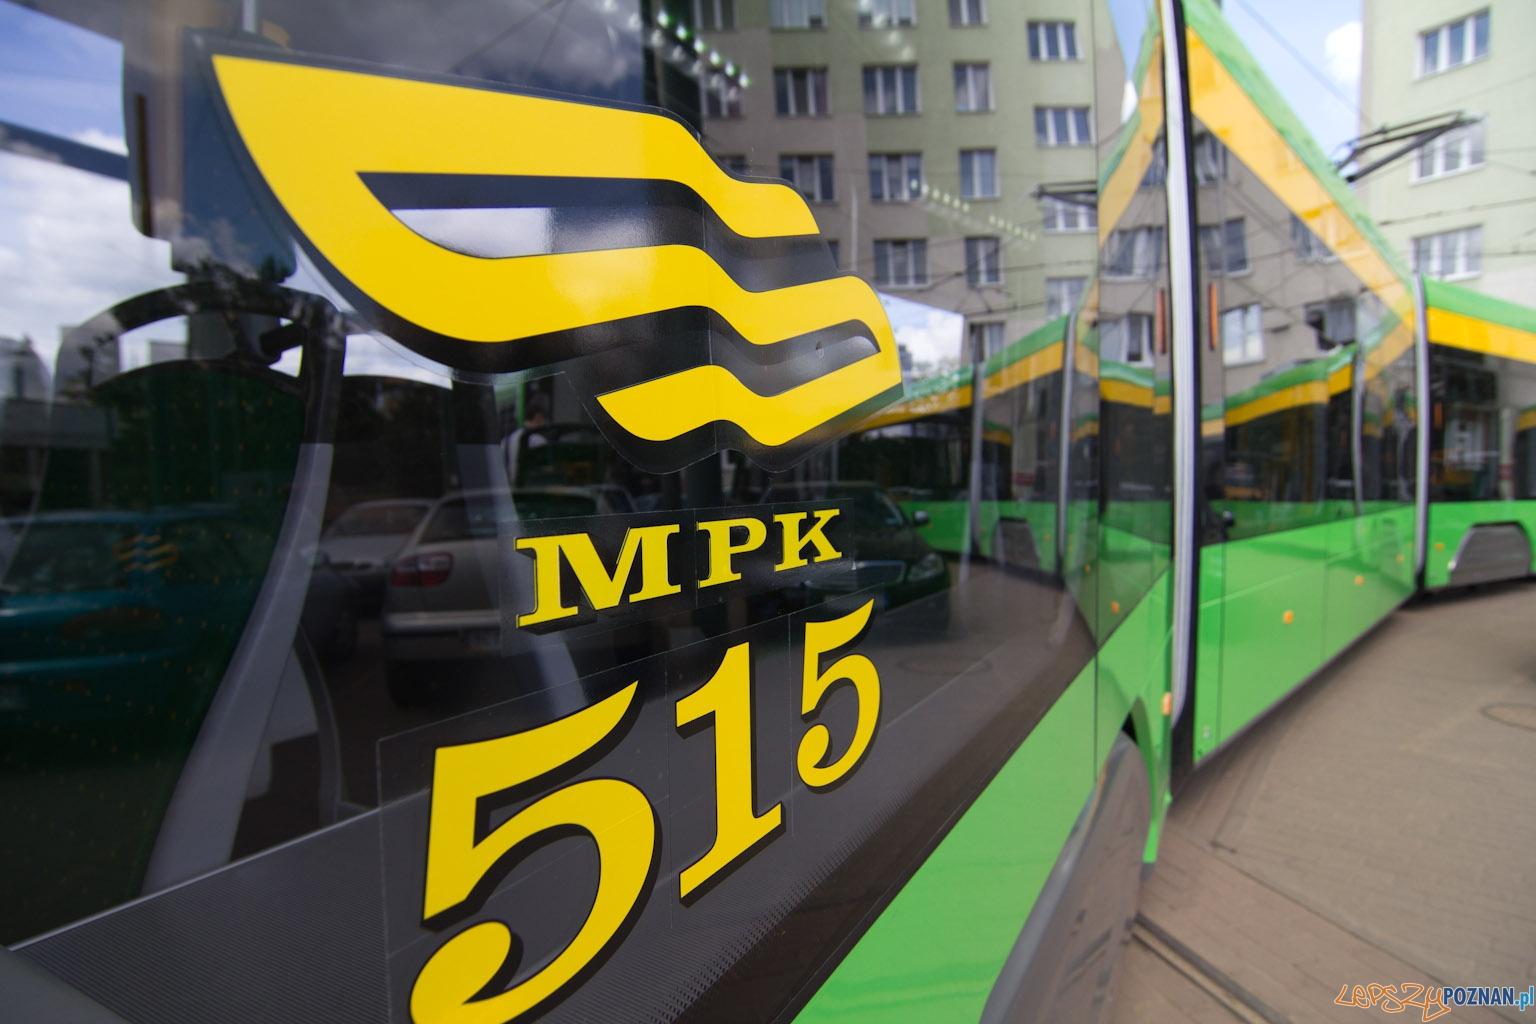 Solaris Tramino  Foto: lepszyPOZNAN.pl / Piotr Rychter